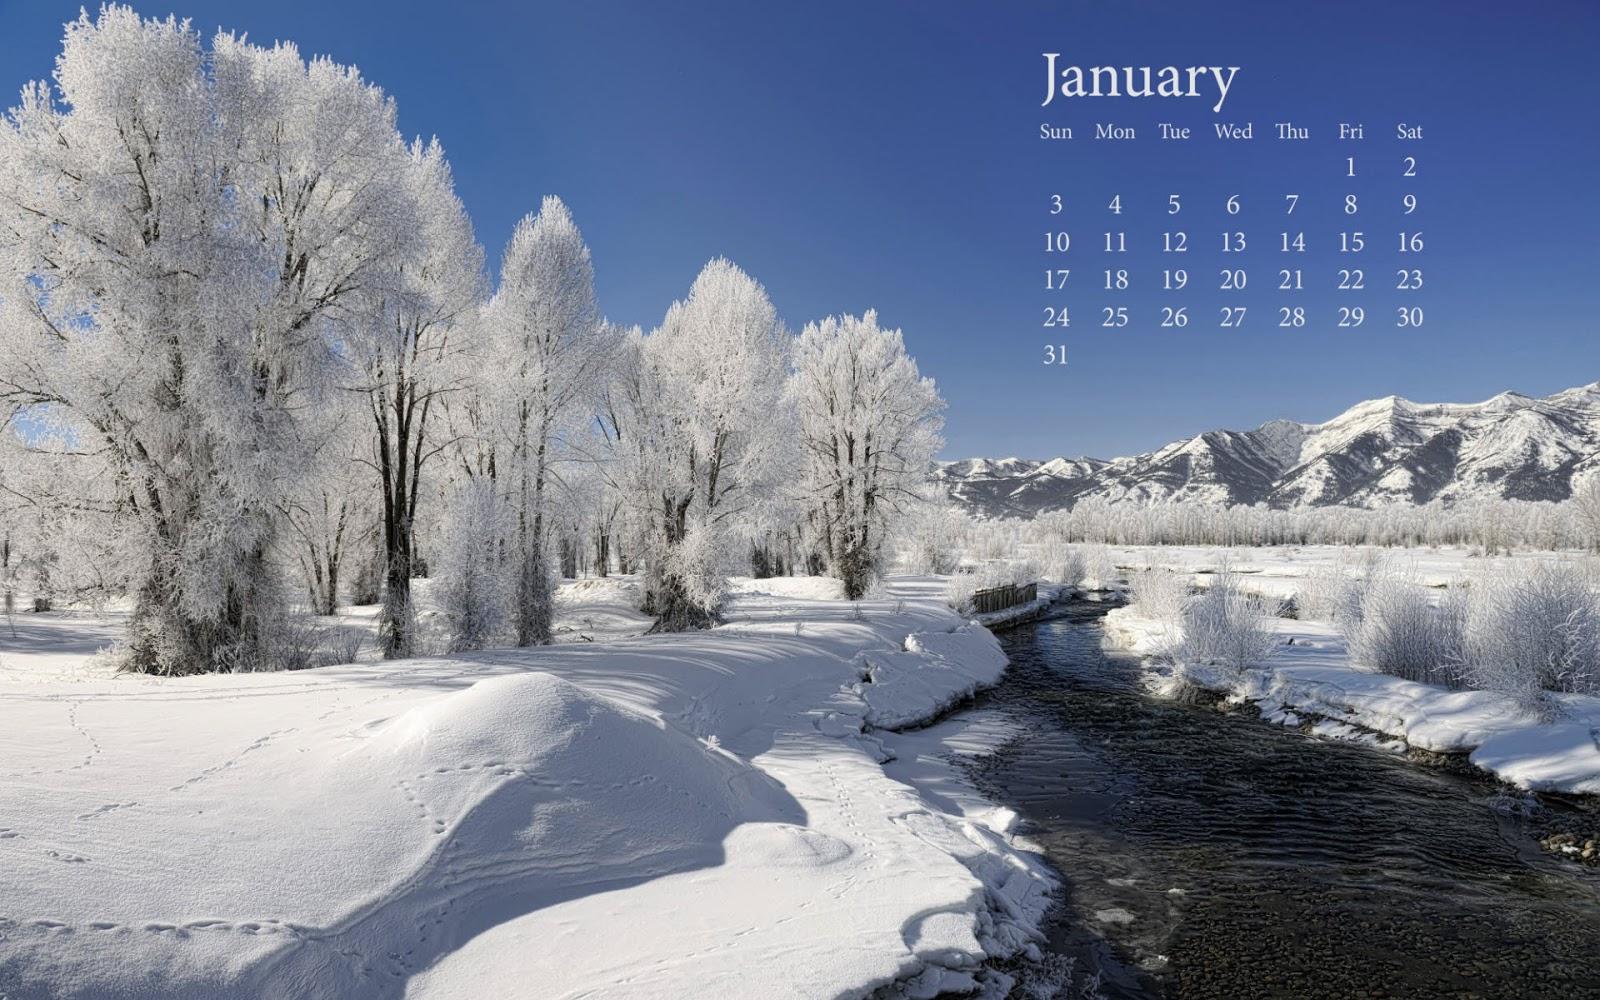 January Calendar Wallpaper Hd : Download free desktop wallpapers january for